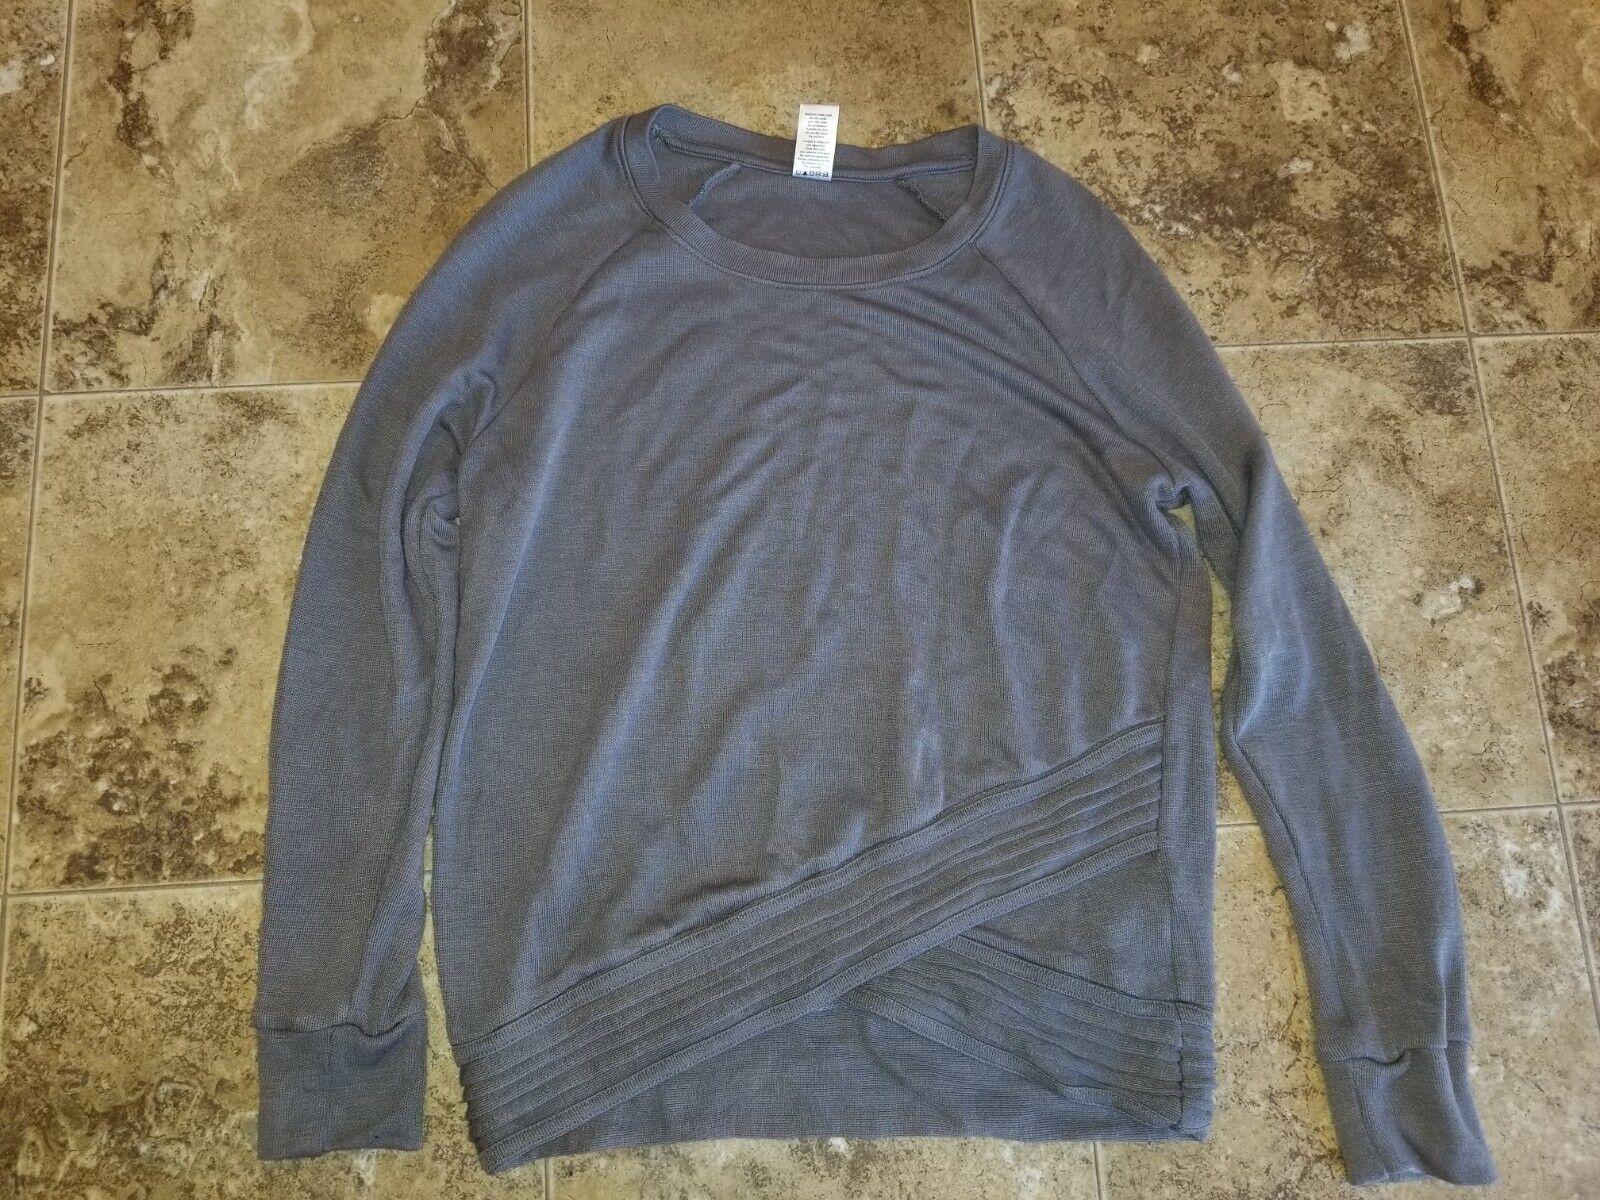 New Womens Active Life Silver Bell Gray Sweatshirt Shirt Lon